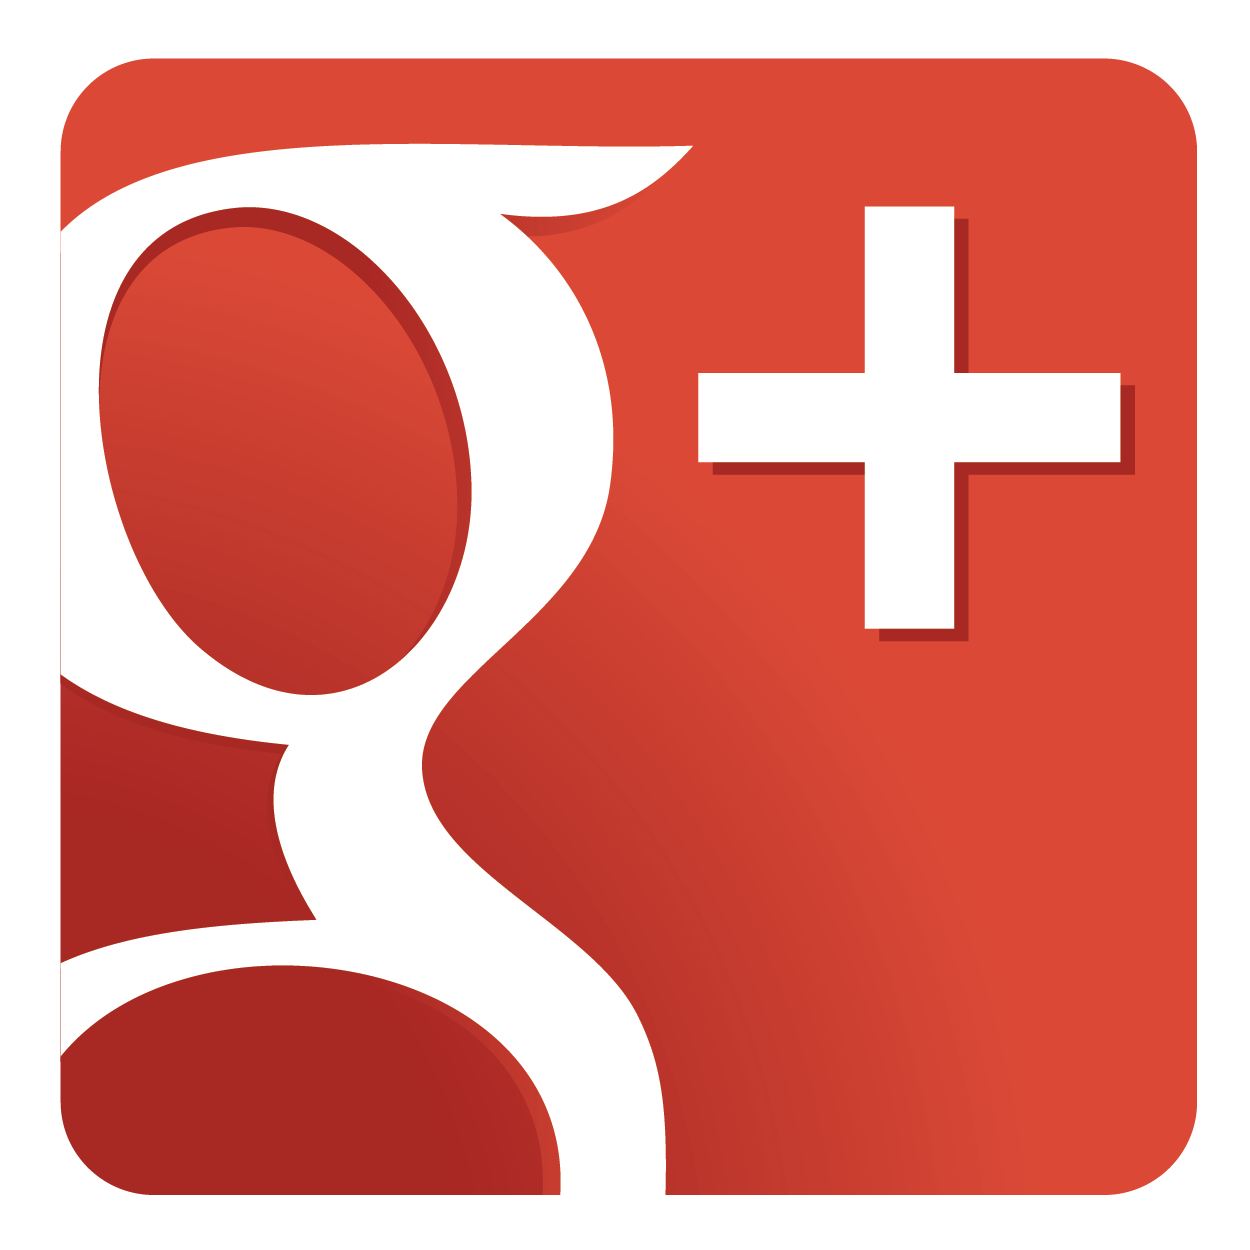 Google+で2015年1月例会『をんな善哉』 - 香川市民劇場を共有